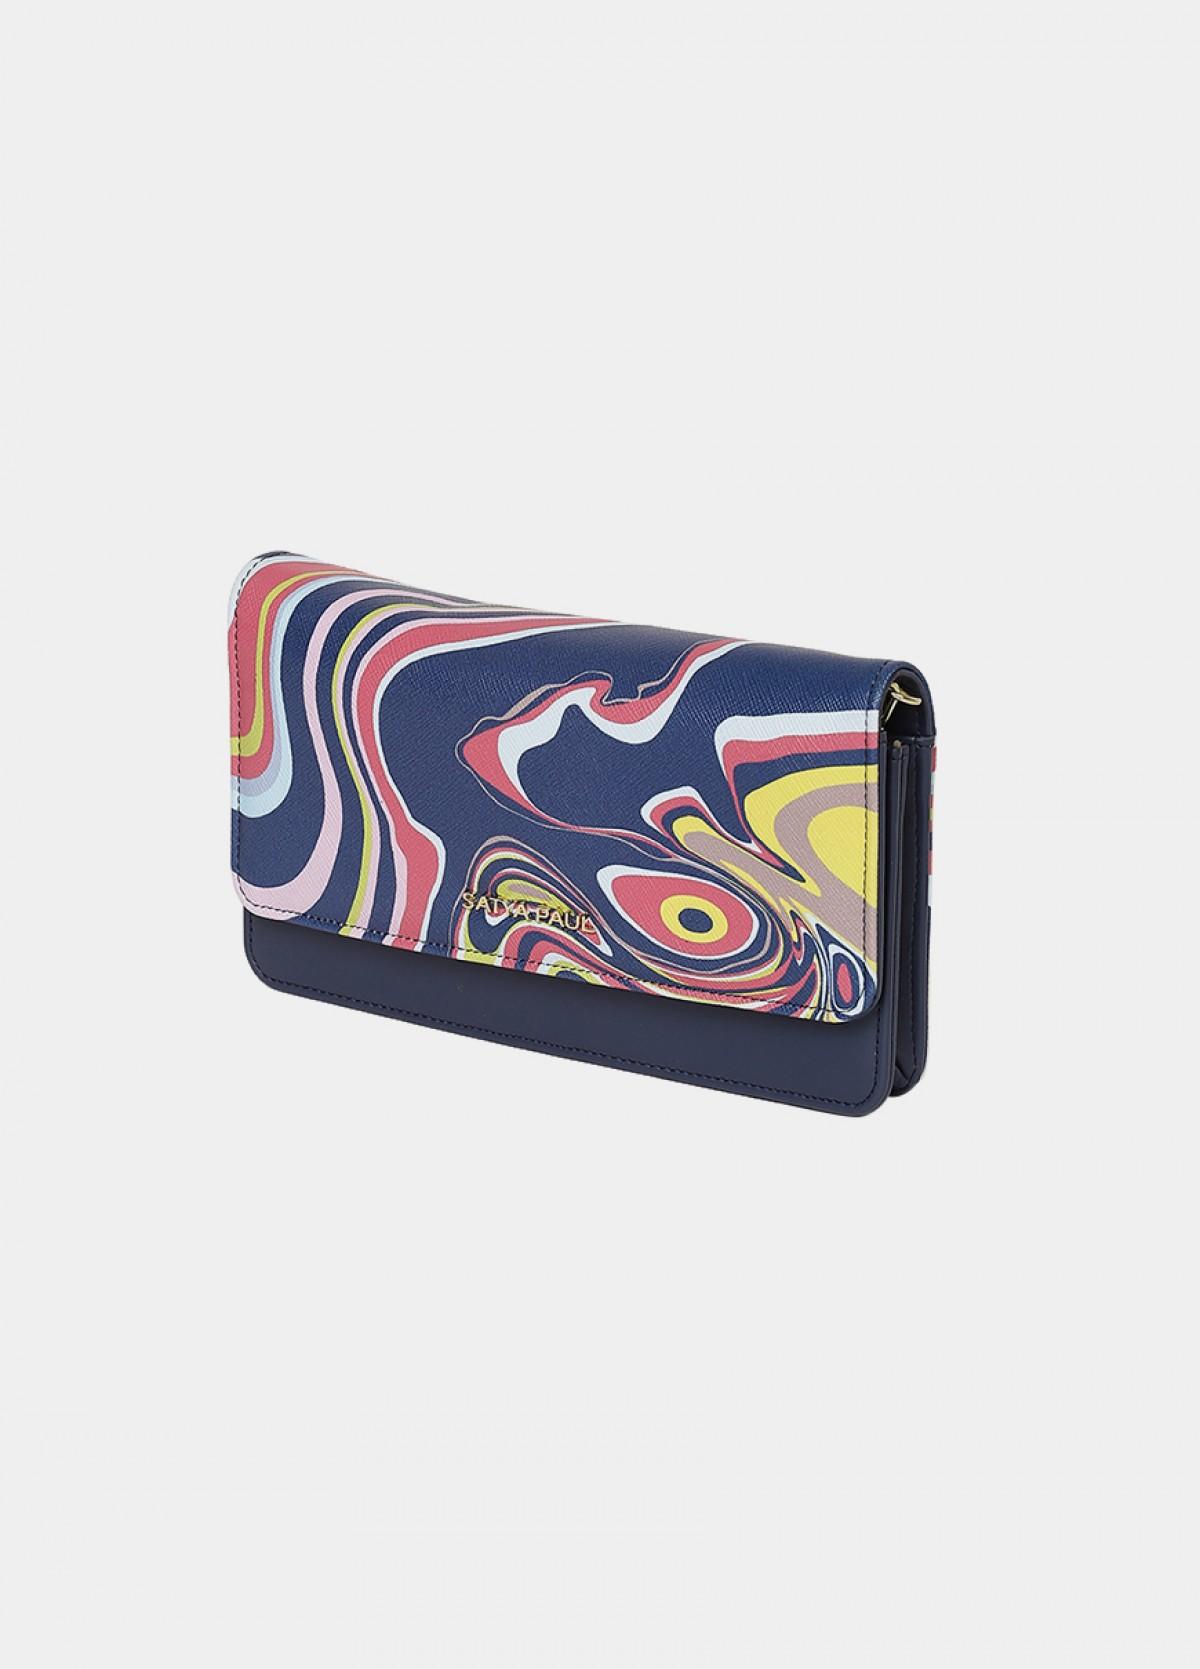 The Vivadelic Wallet